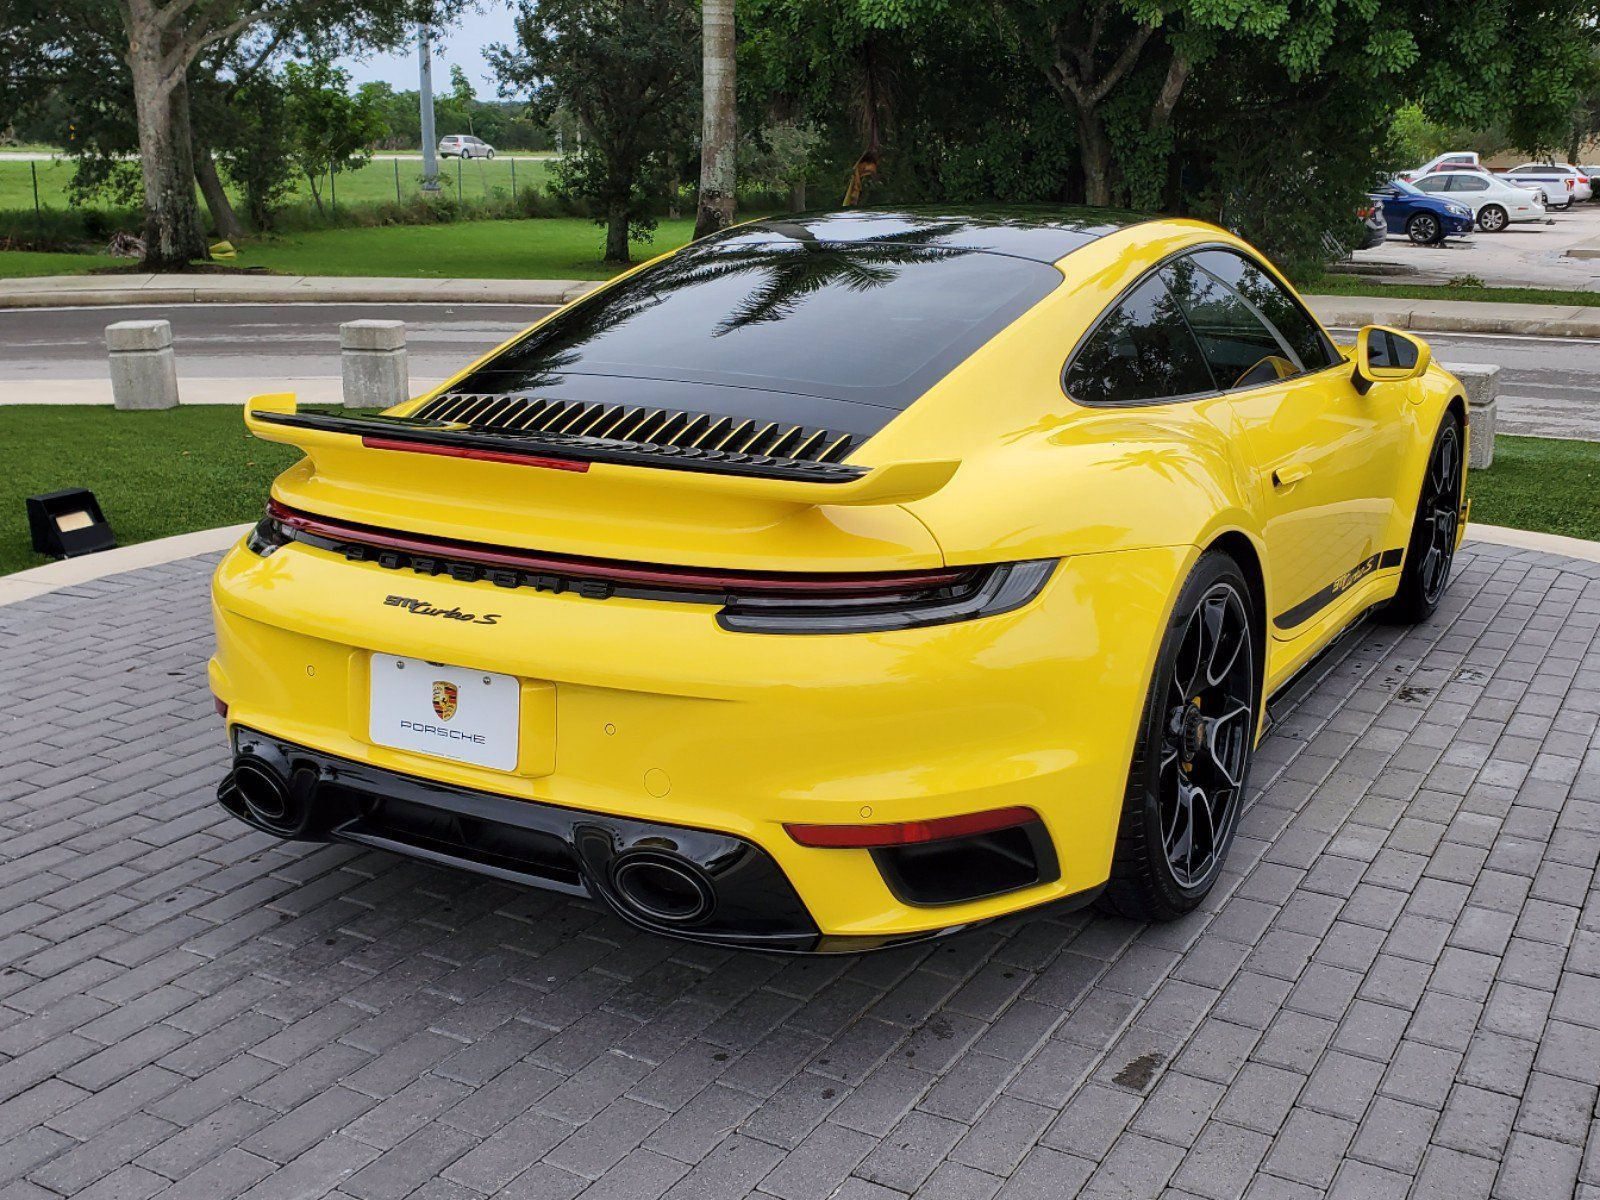 2021 Porsche 911 Turbo S – 5